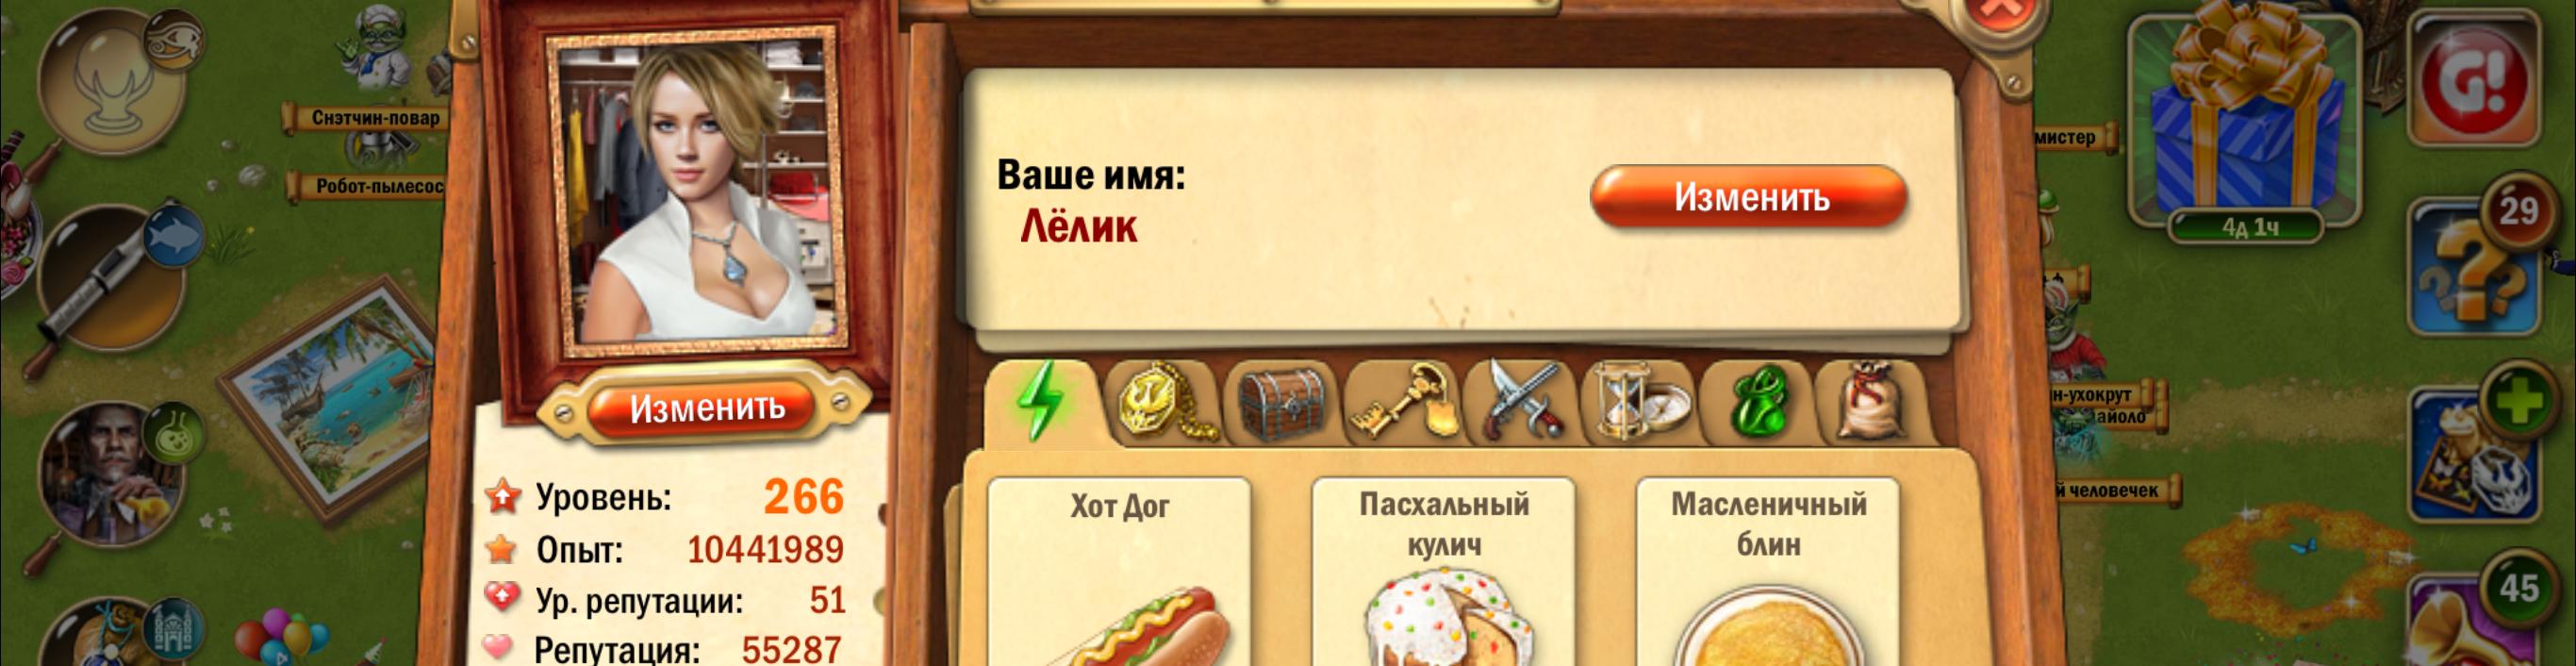 http://s5.uploads.ru/PtTmA.jpg